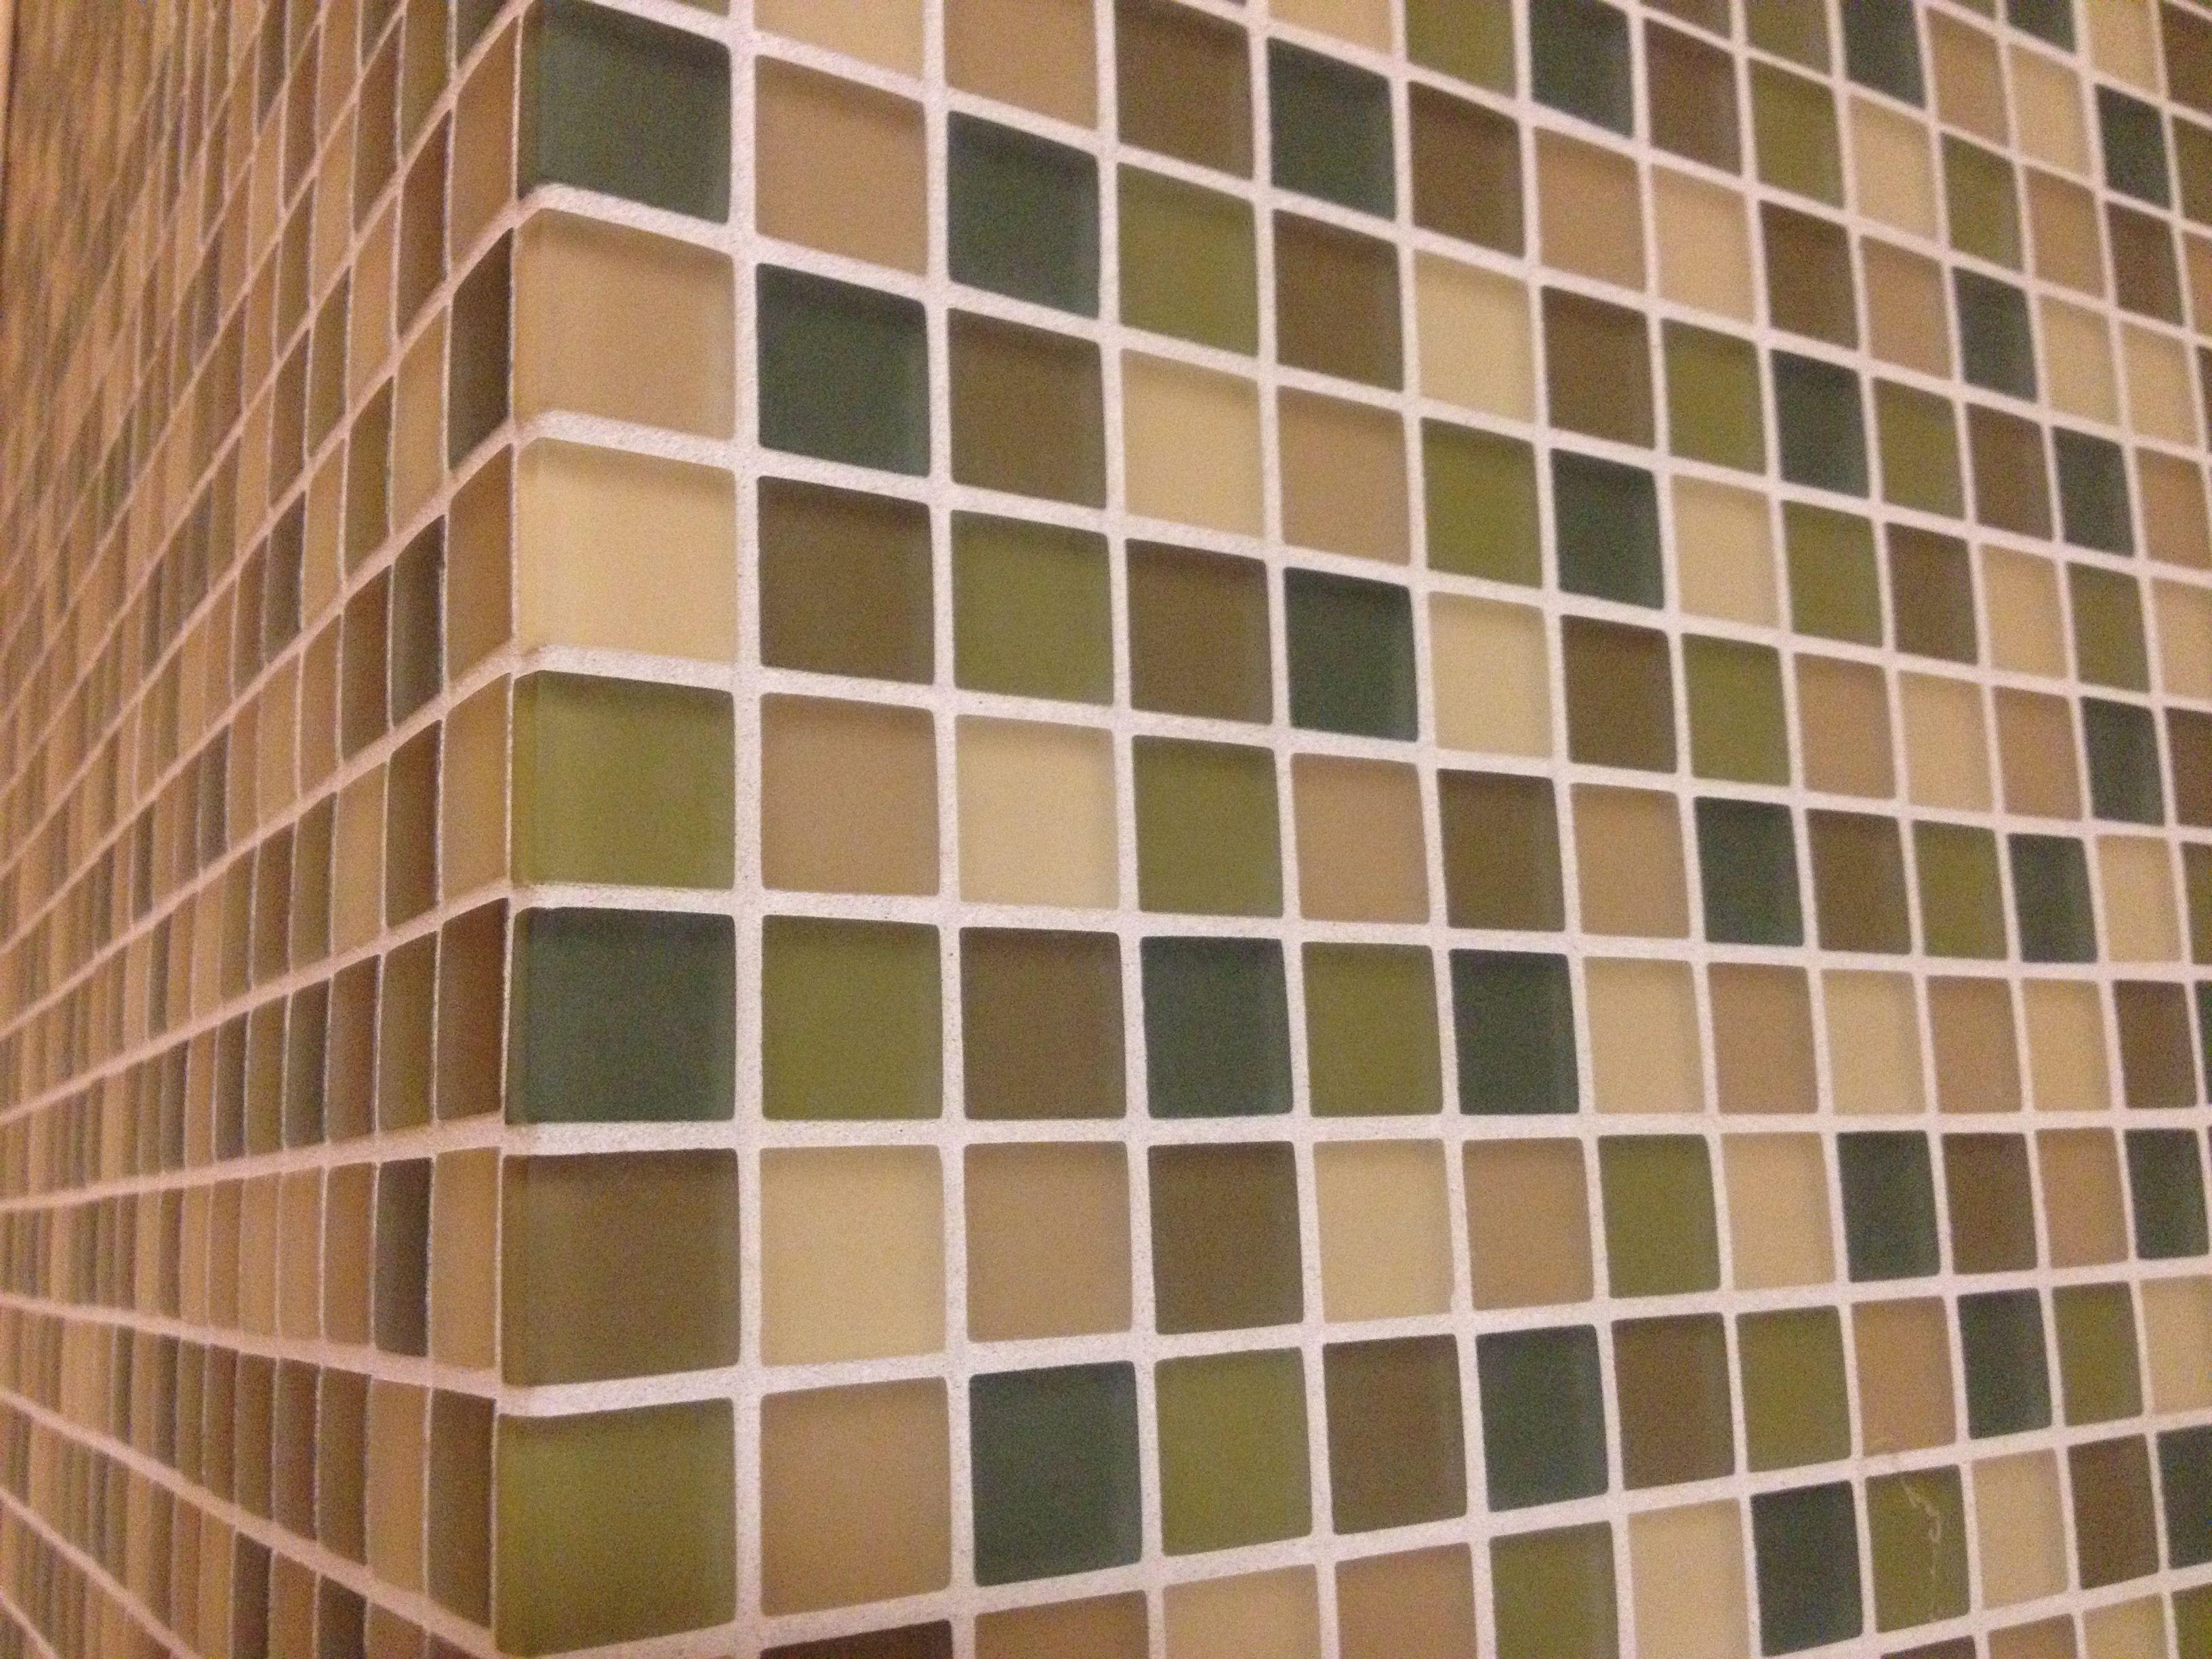 - Green And Tan Glass Tile - Backsplash? Glass Tile Backsplash